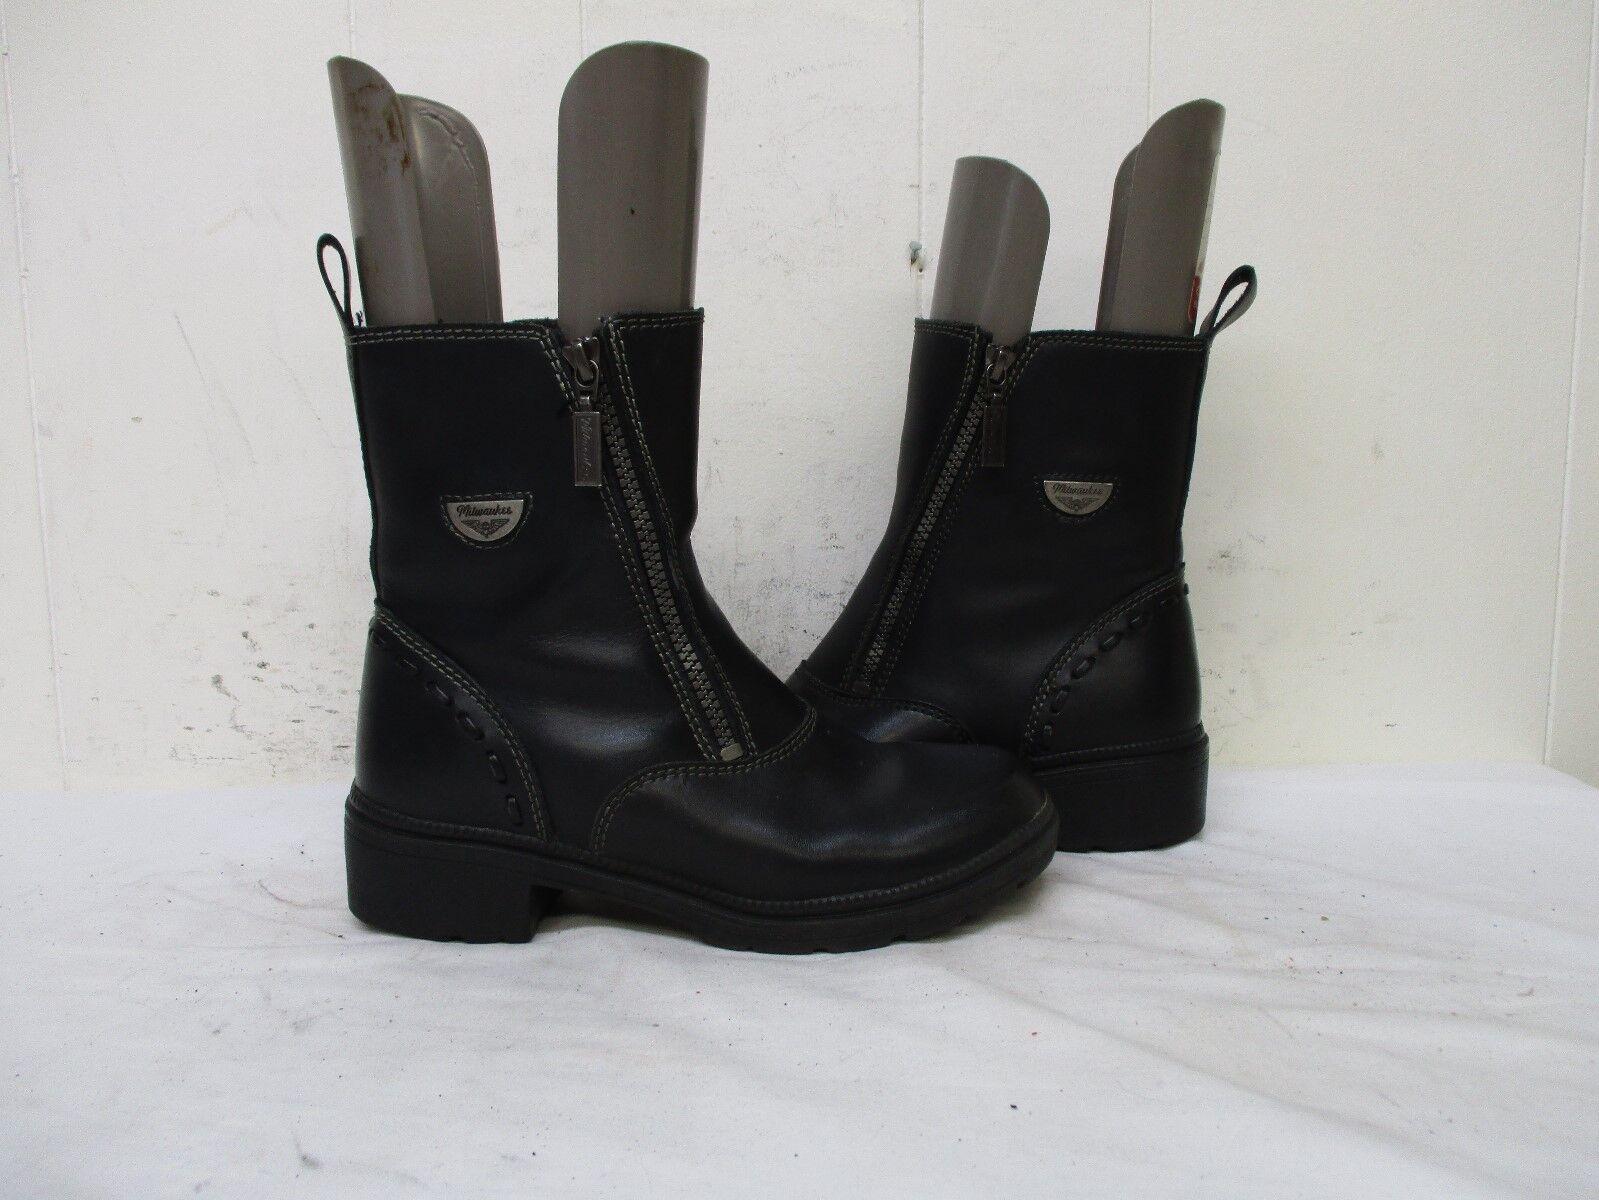 MILWAUKEE Black Leather Double Zip Biker Boots Womens Size 7 B Style MVB206